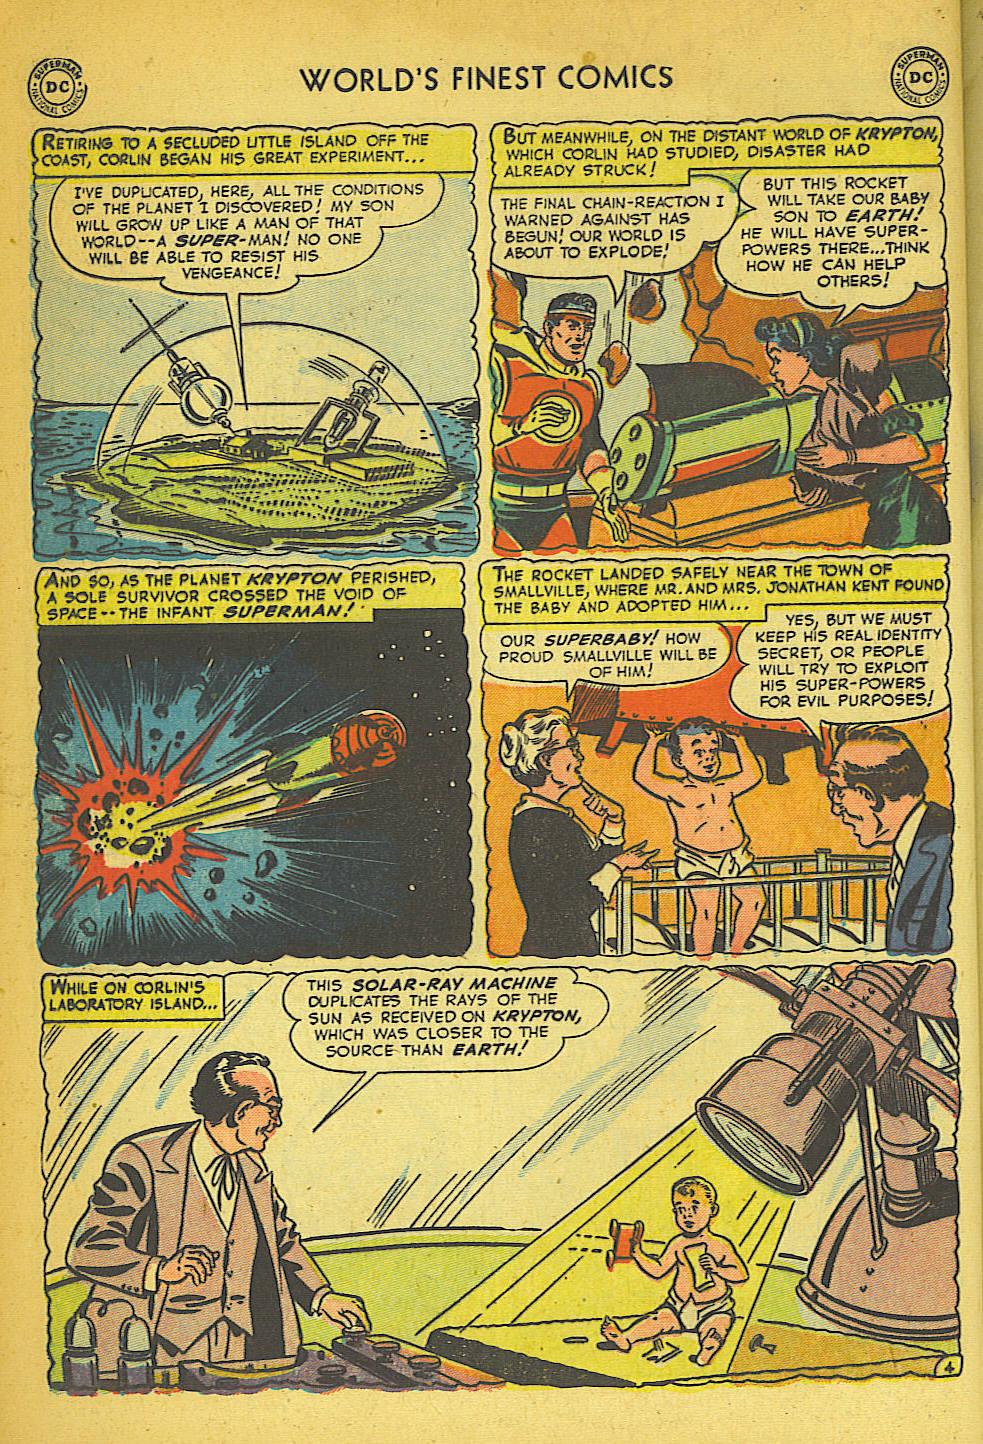 Read online World's Finest Comics comic -  Issue #57 - 6